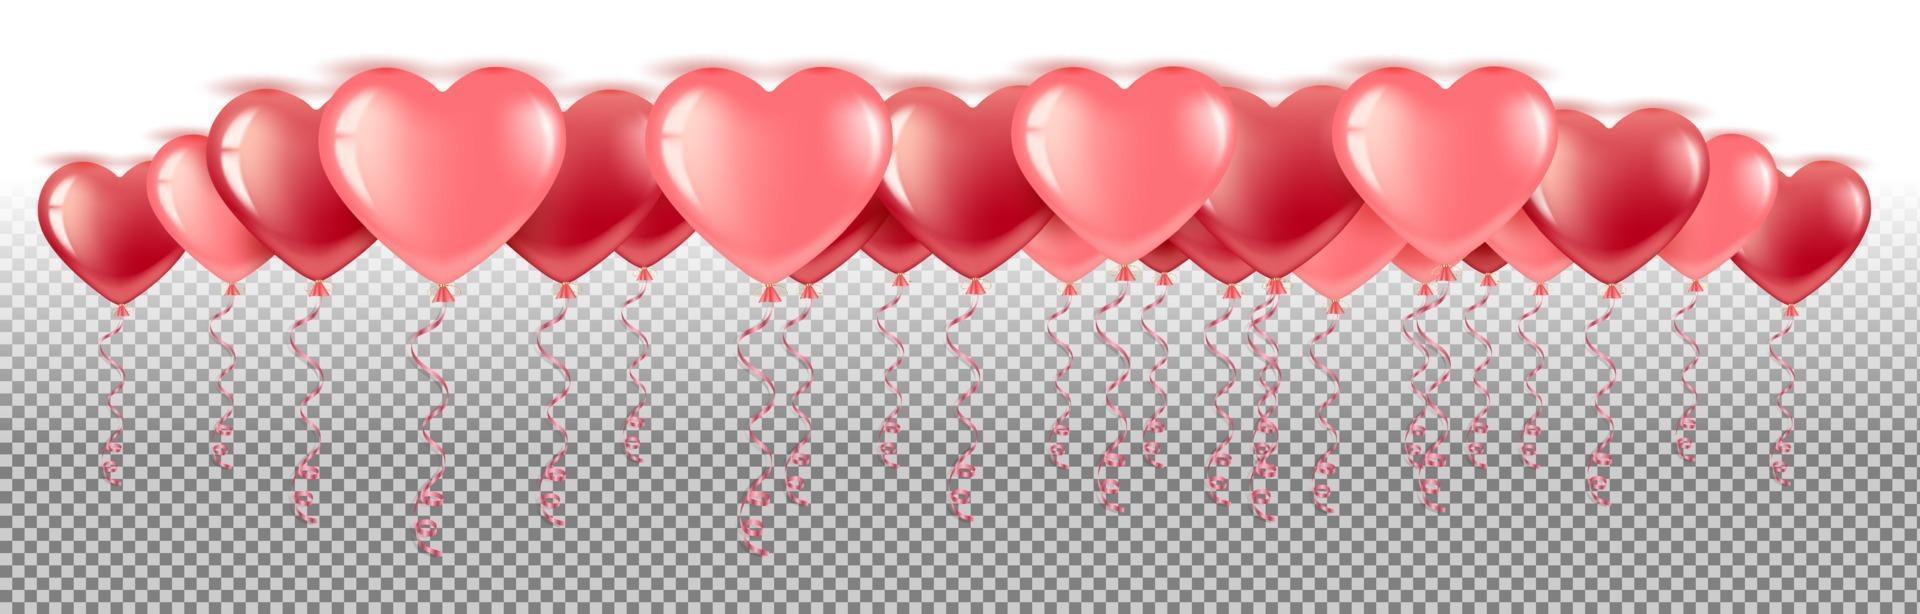 beaucoup de vecteur de ballons coeur